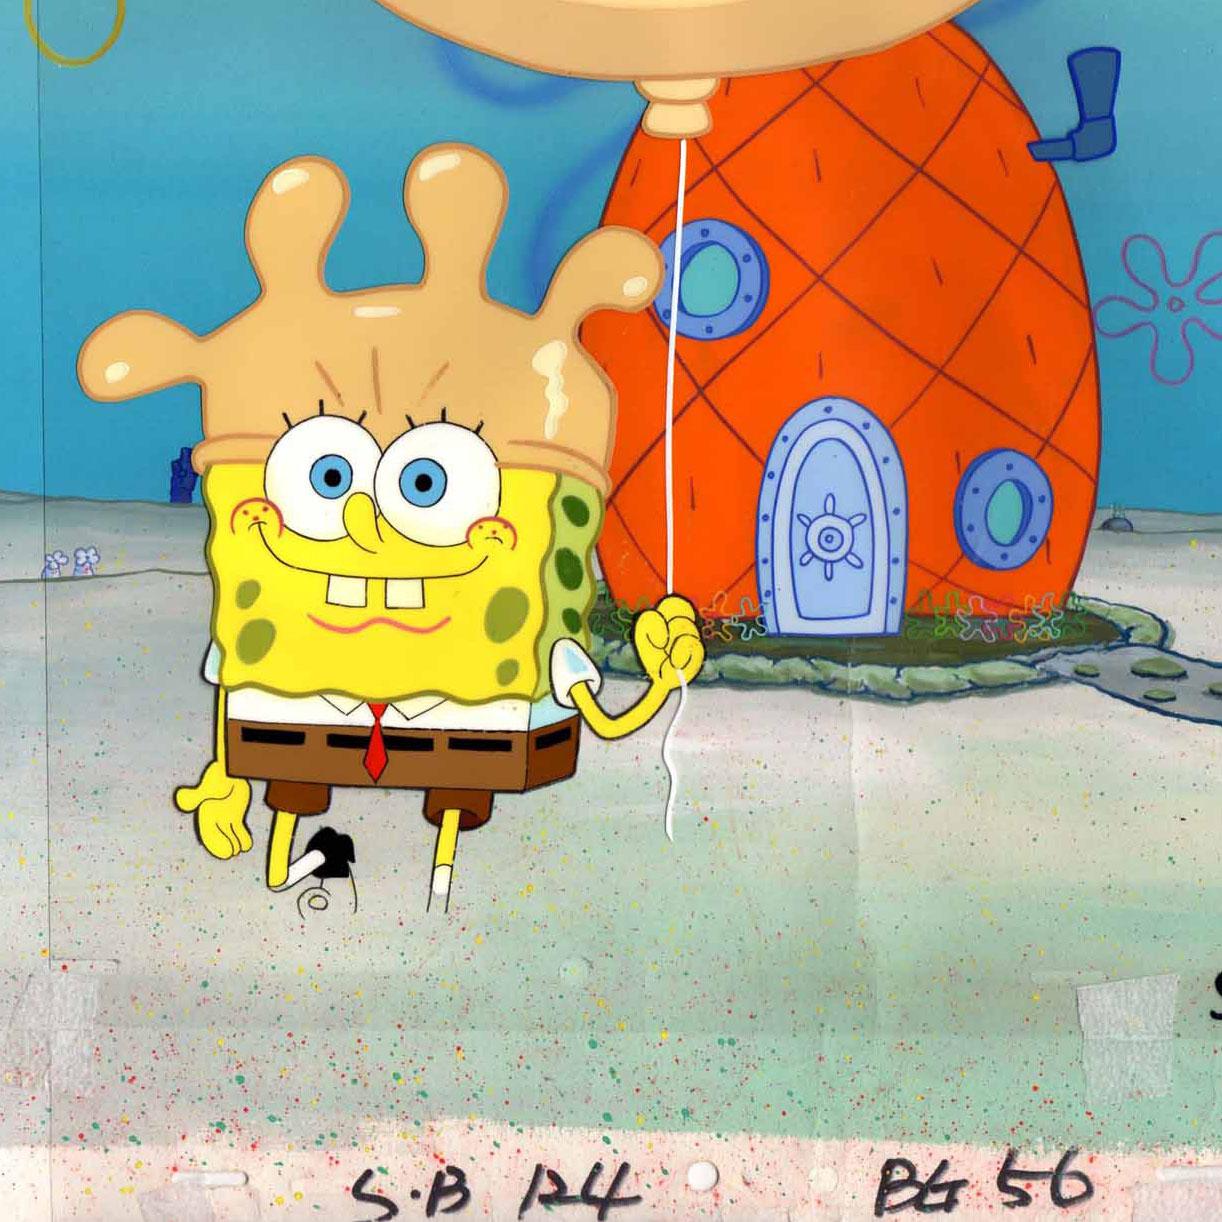 spongebob-icon.jpg